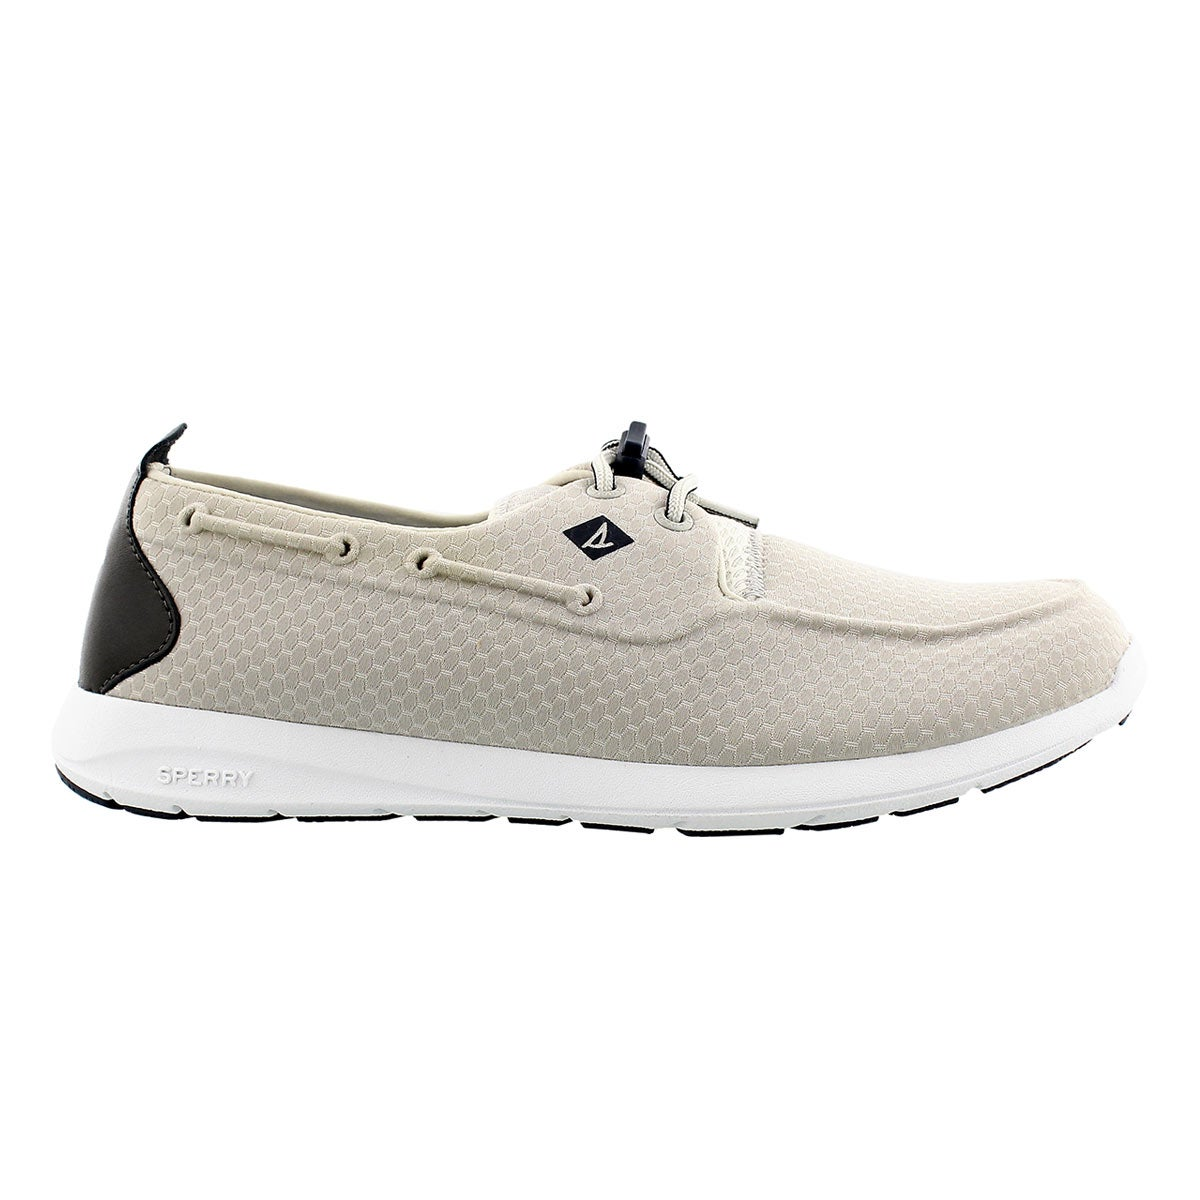 Mns Sojourn silver molded mesh sneaker